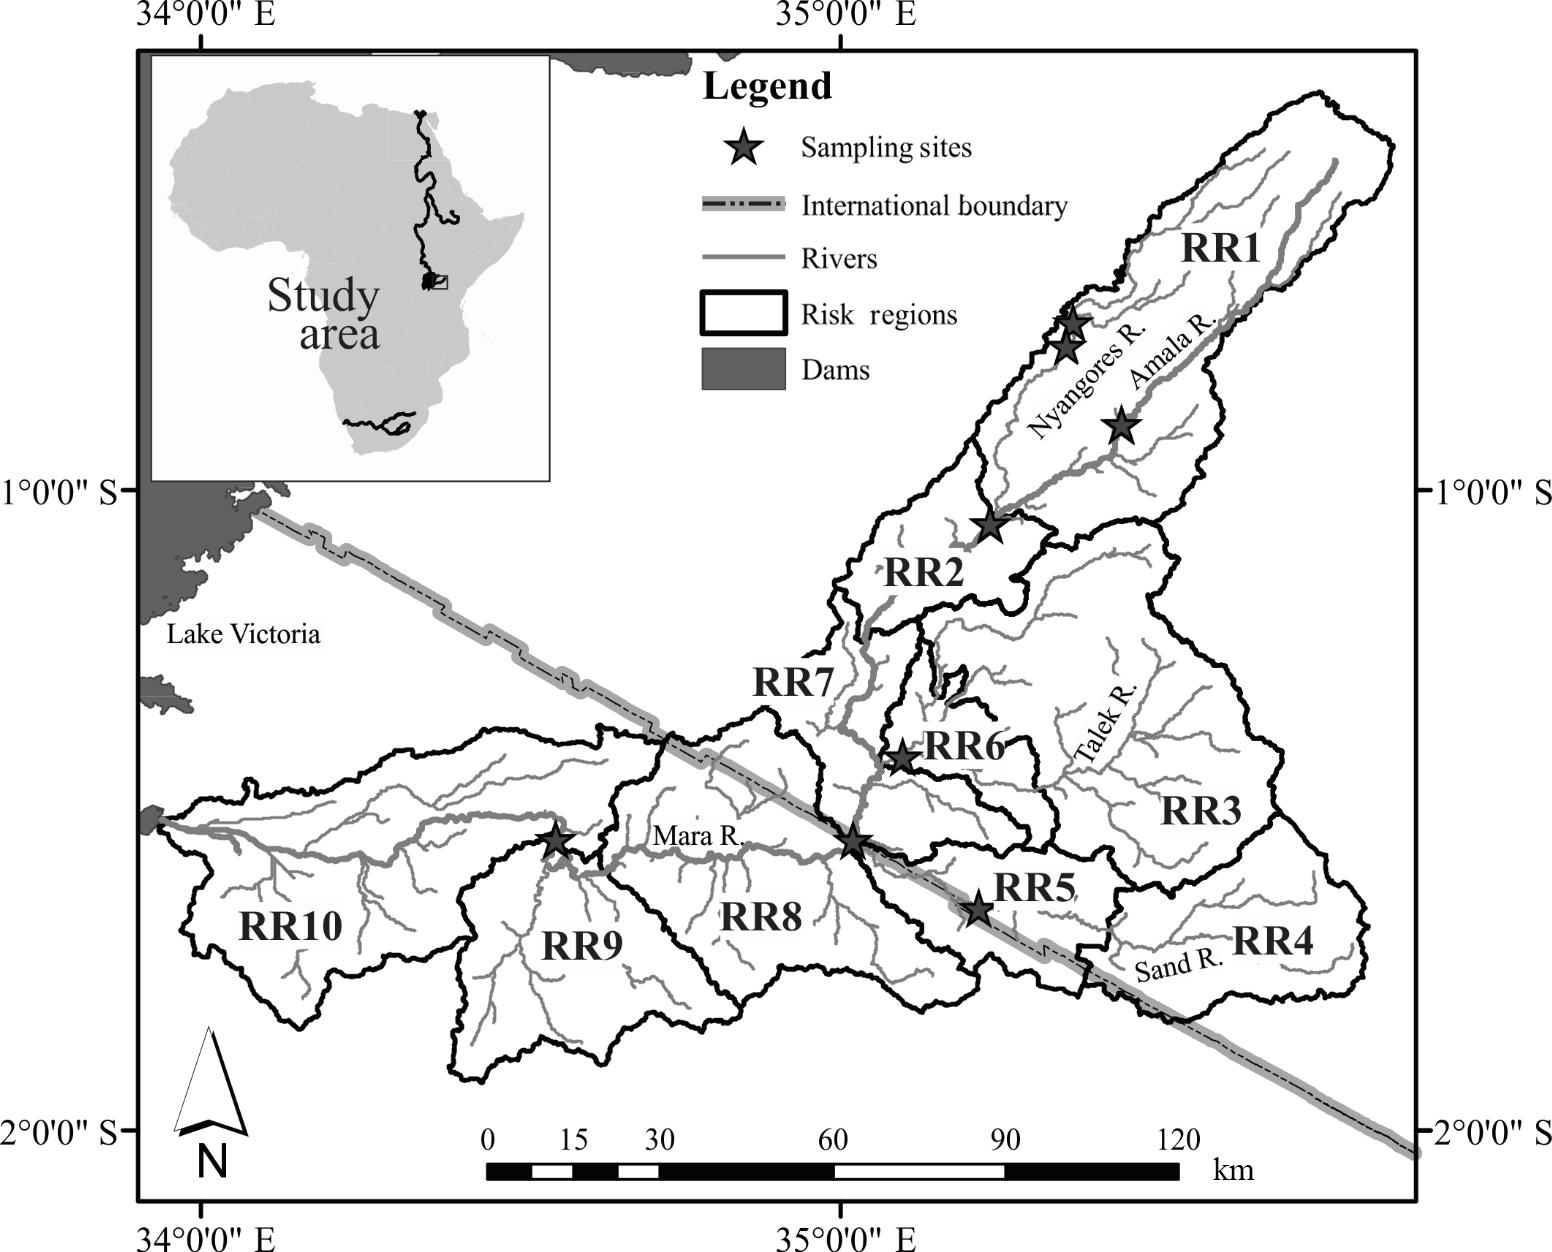 HESS - A regional-scale ecological risk framework for environmental